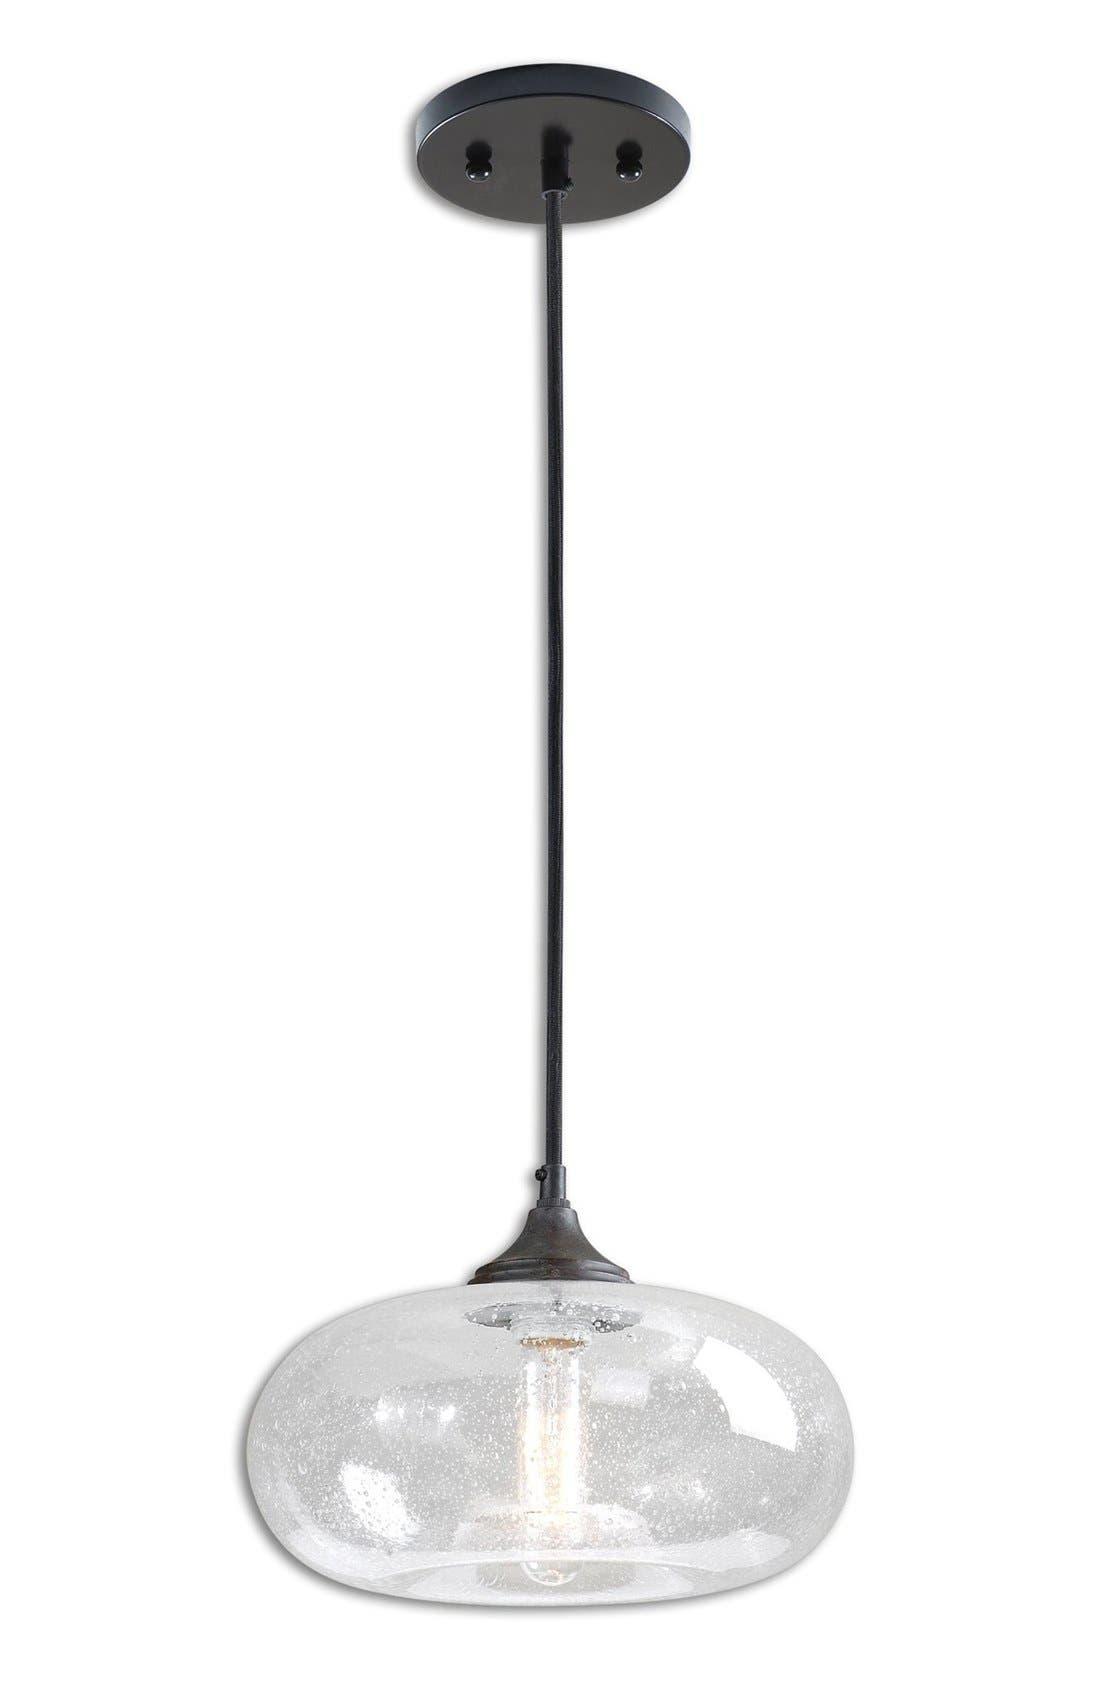 Main Image - Uttermost 'Torus' Seeded Glass Mini Pendant Light